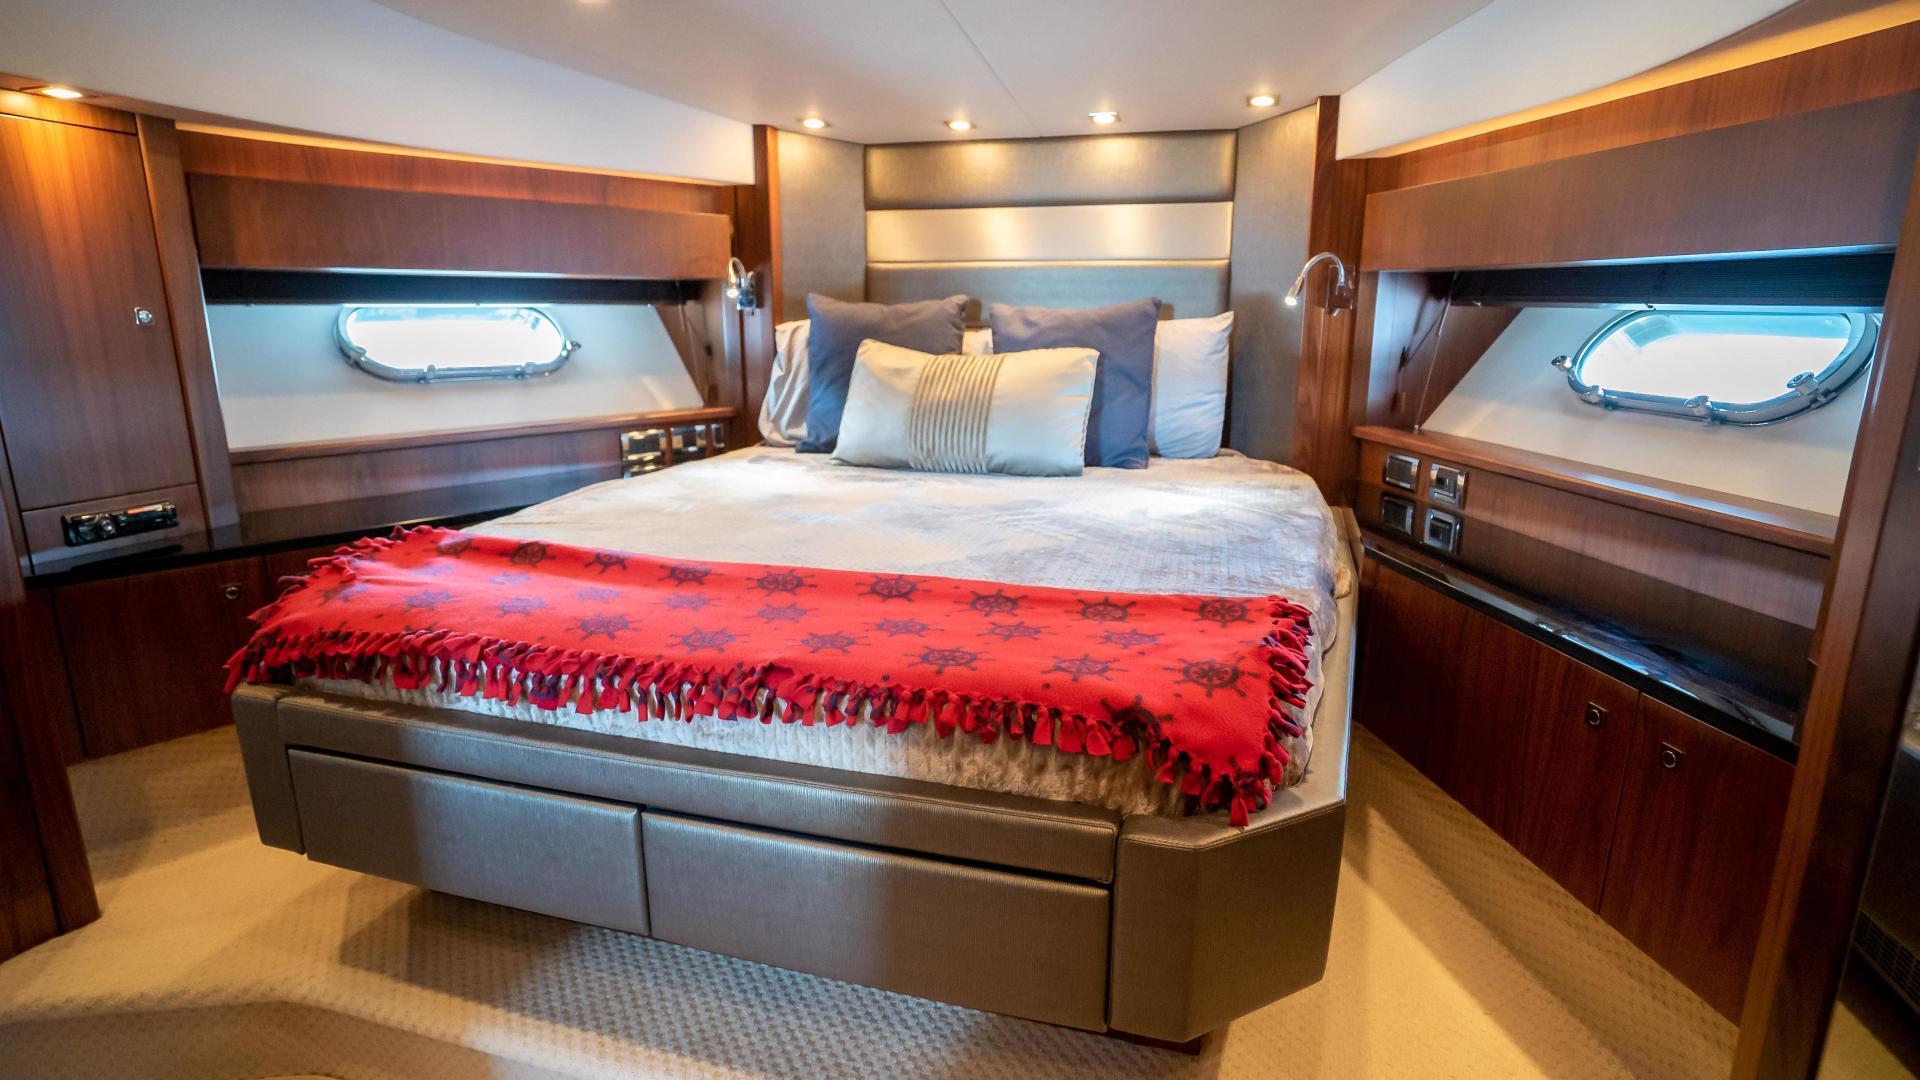 Sunseeker-Motor yacht 2012-JIMBO New Port-Rhode Island-United States-1480201 | Thumbnail